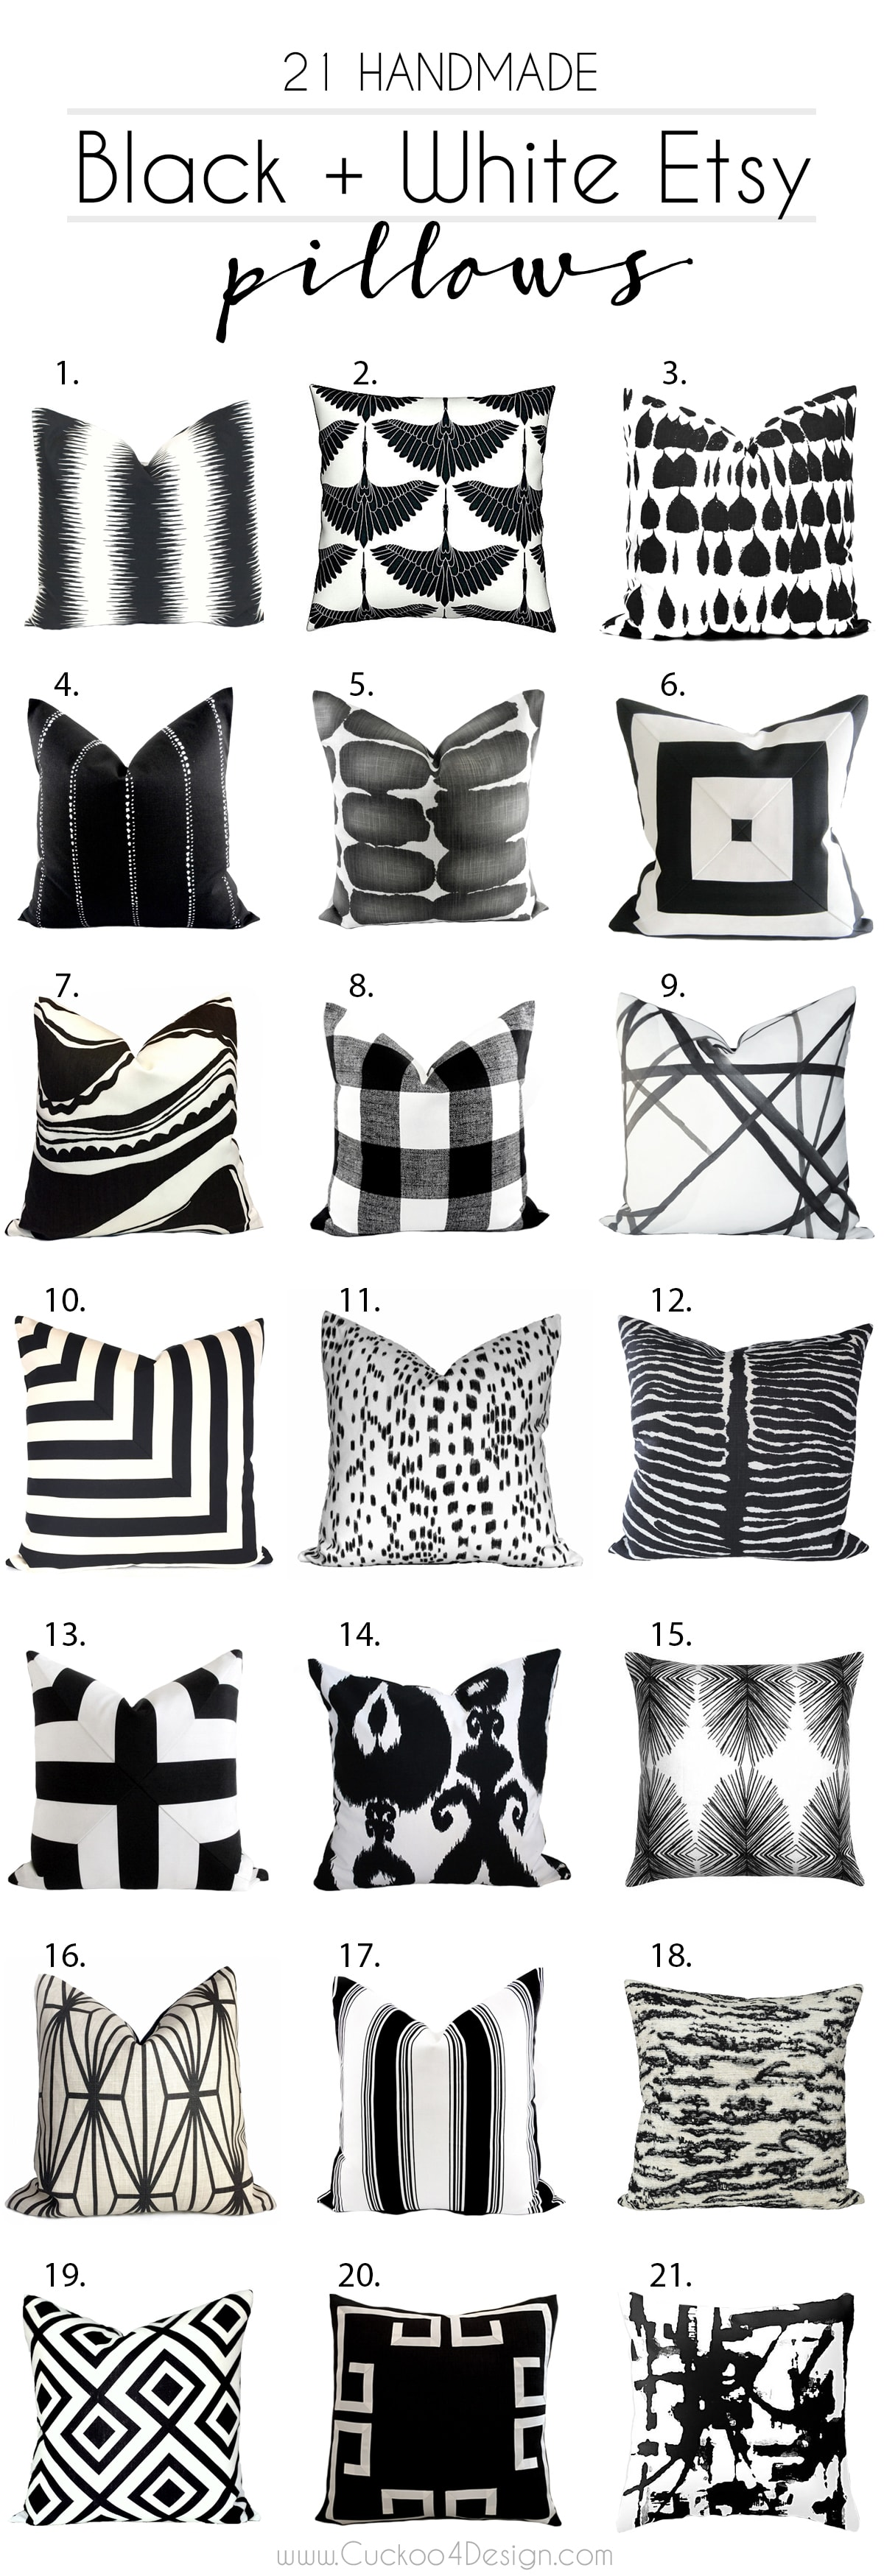 Friday Favorites 21 Handmade Black And White Etsy Pillows